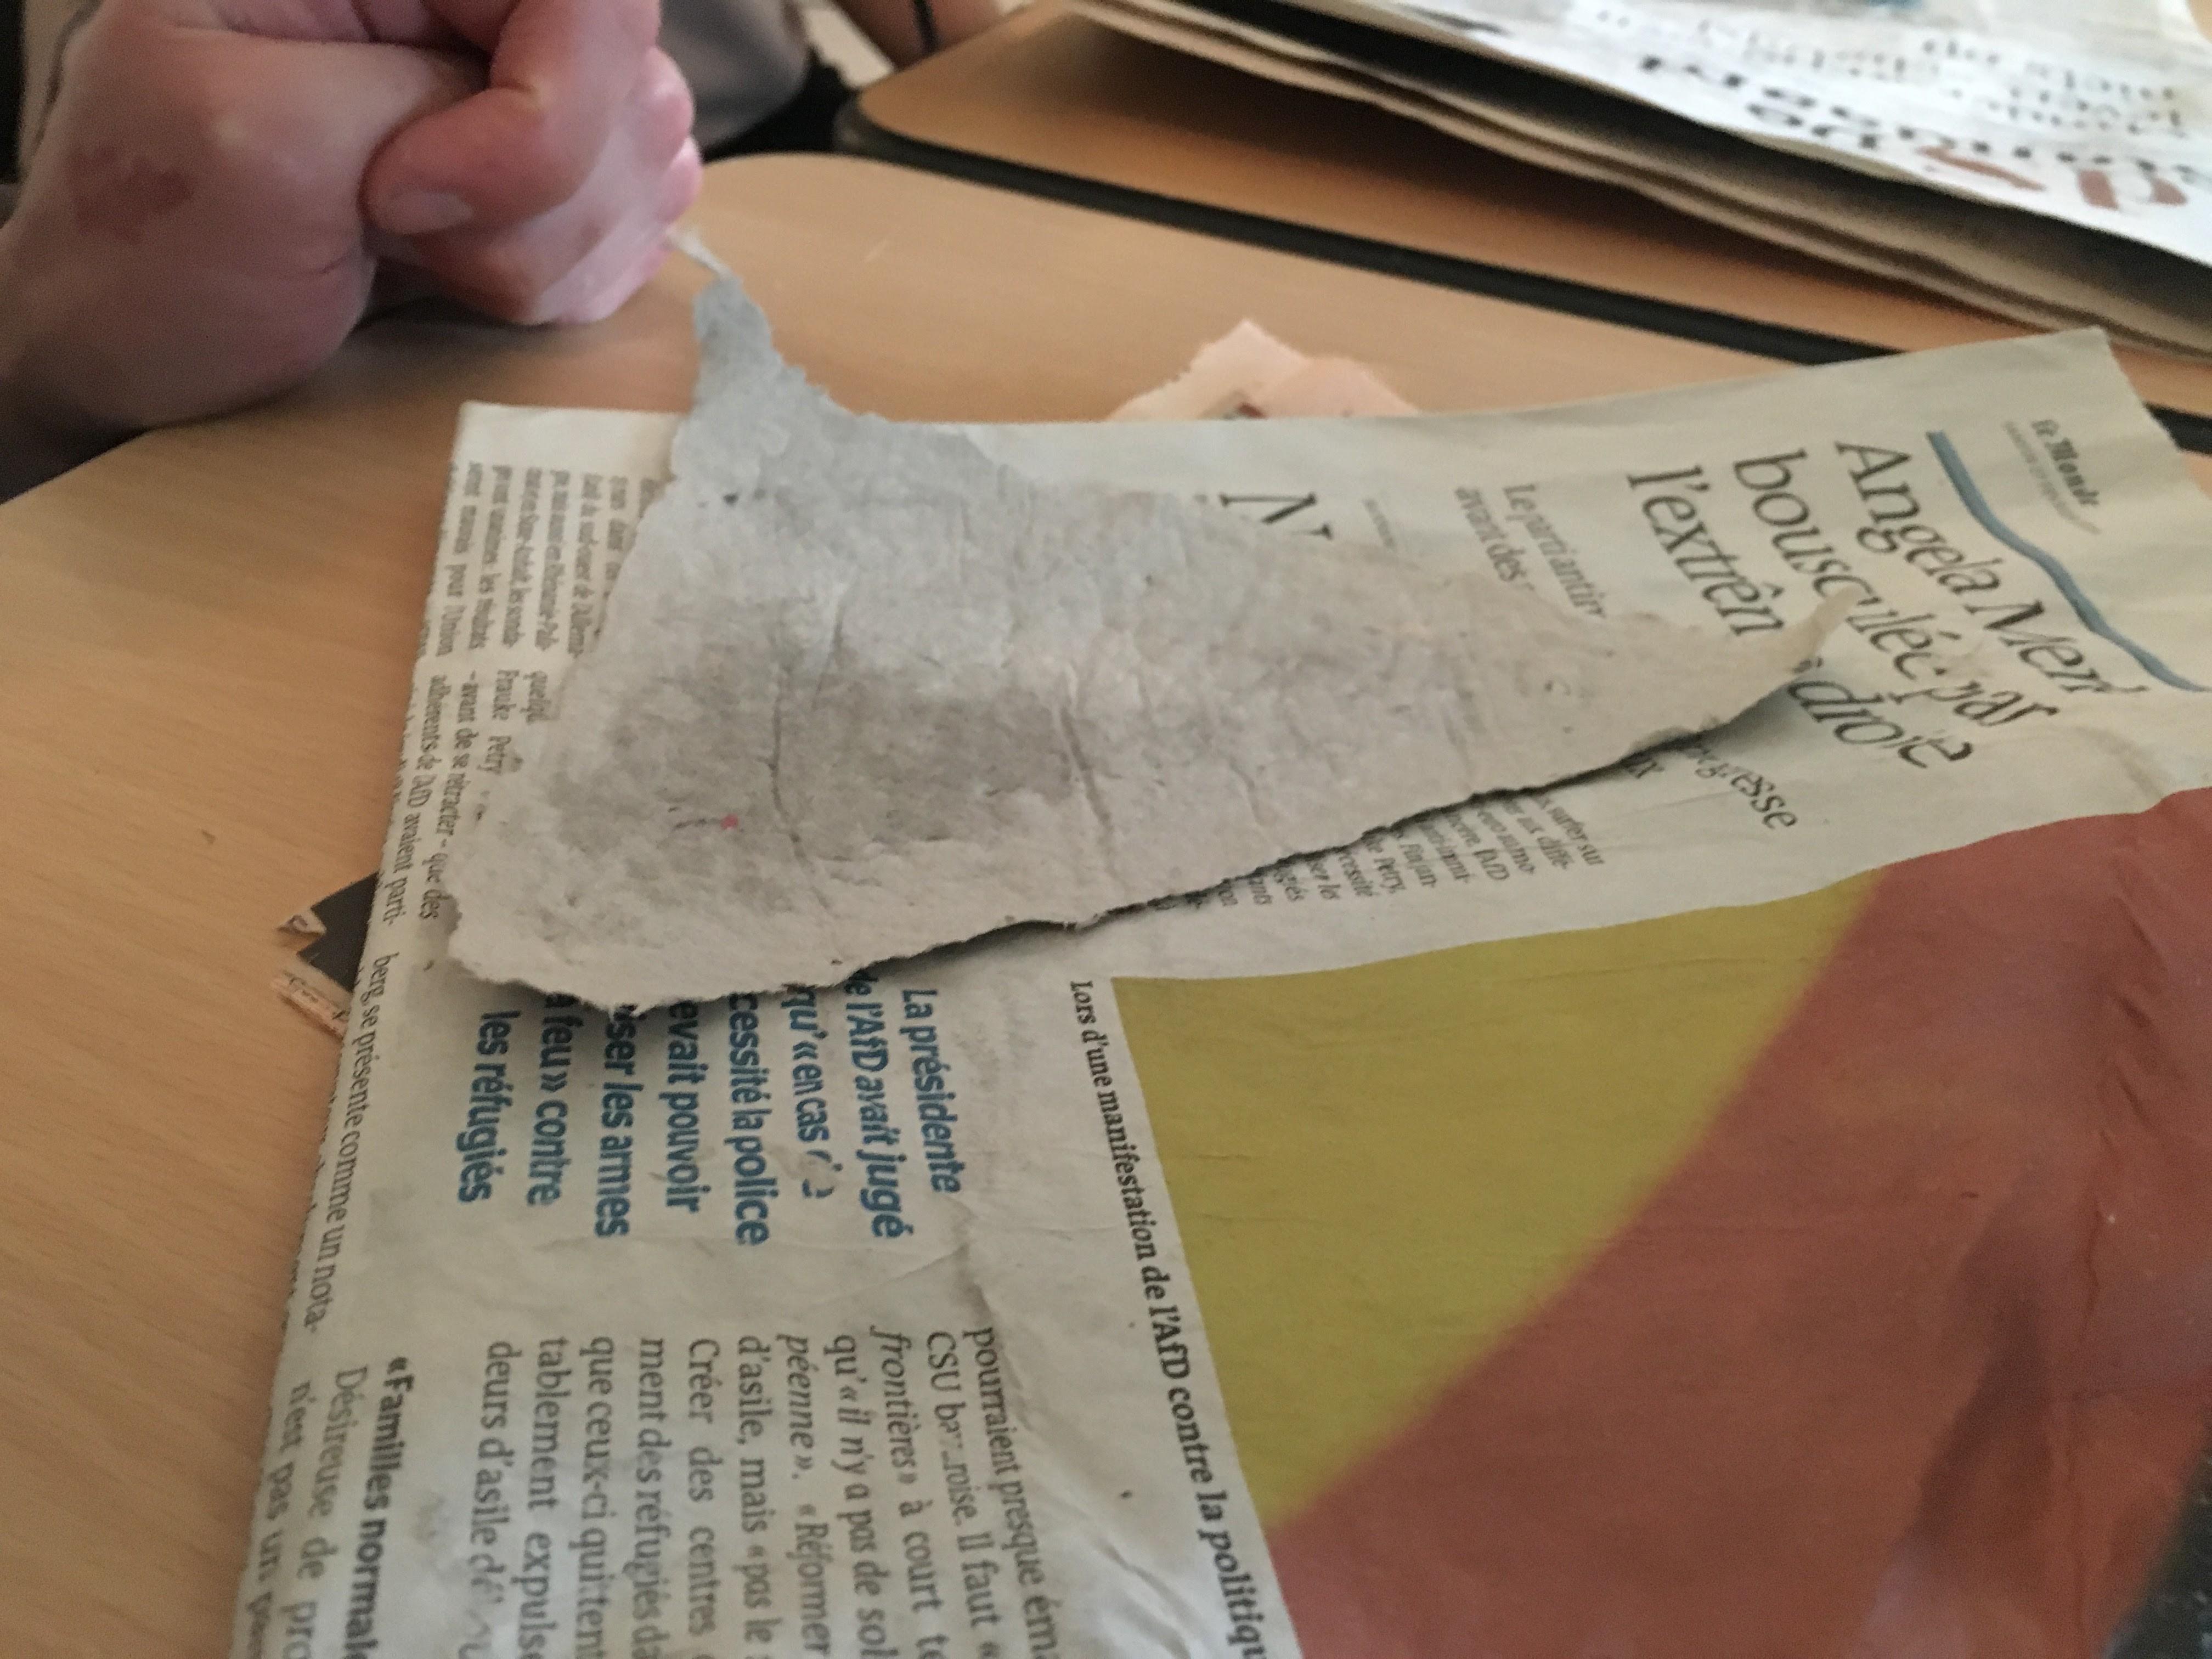 Fabrication de papiers recyclés